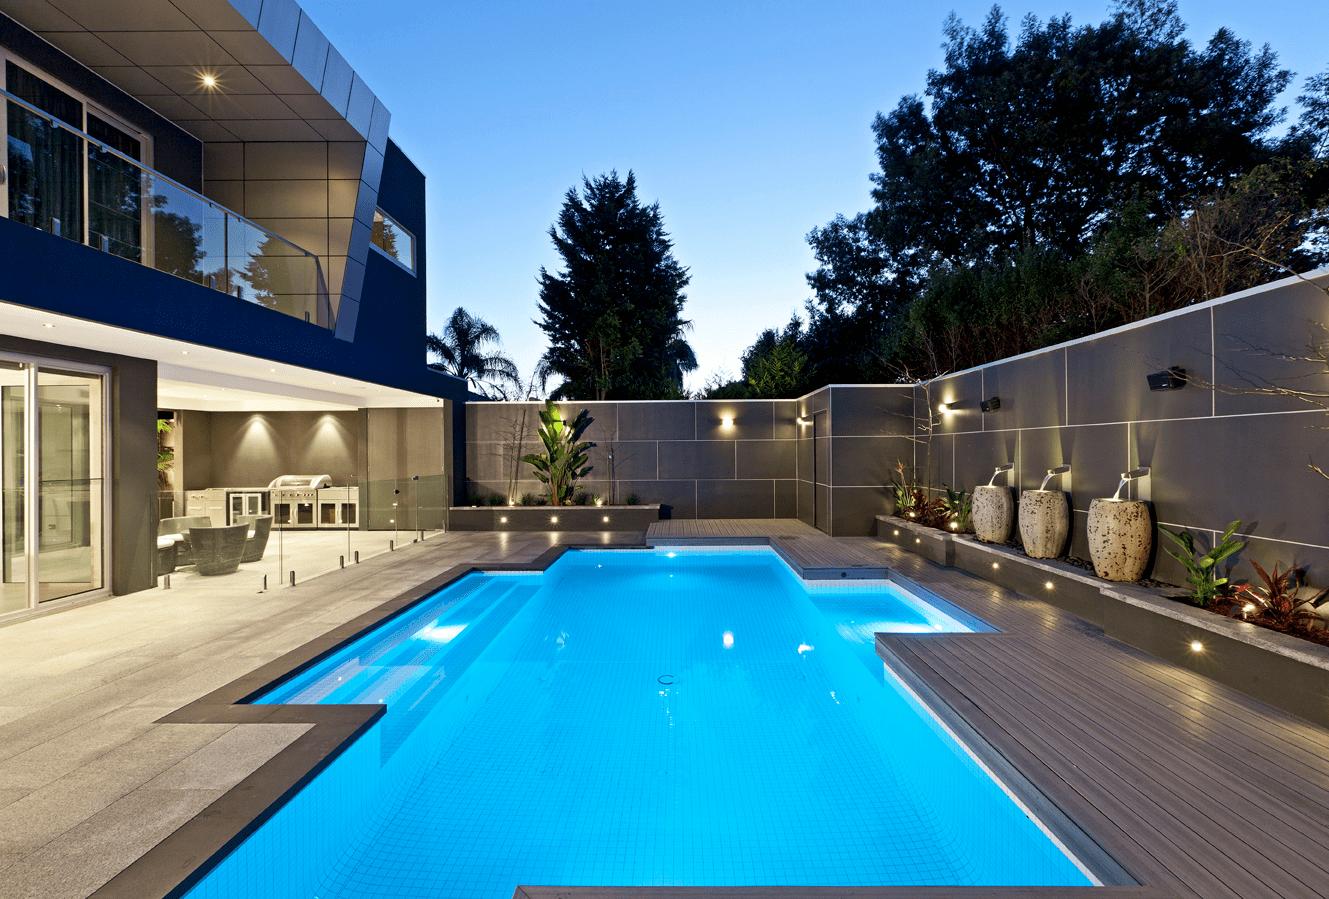 Swimming pool wall decor